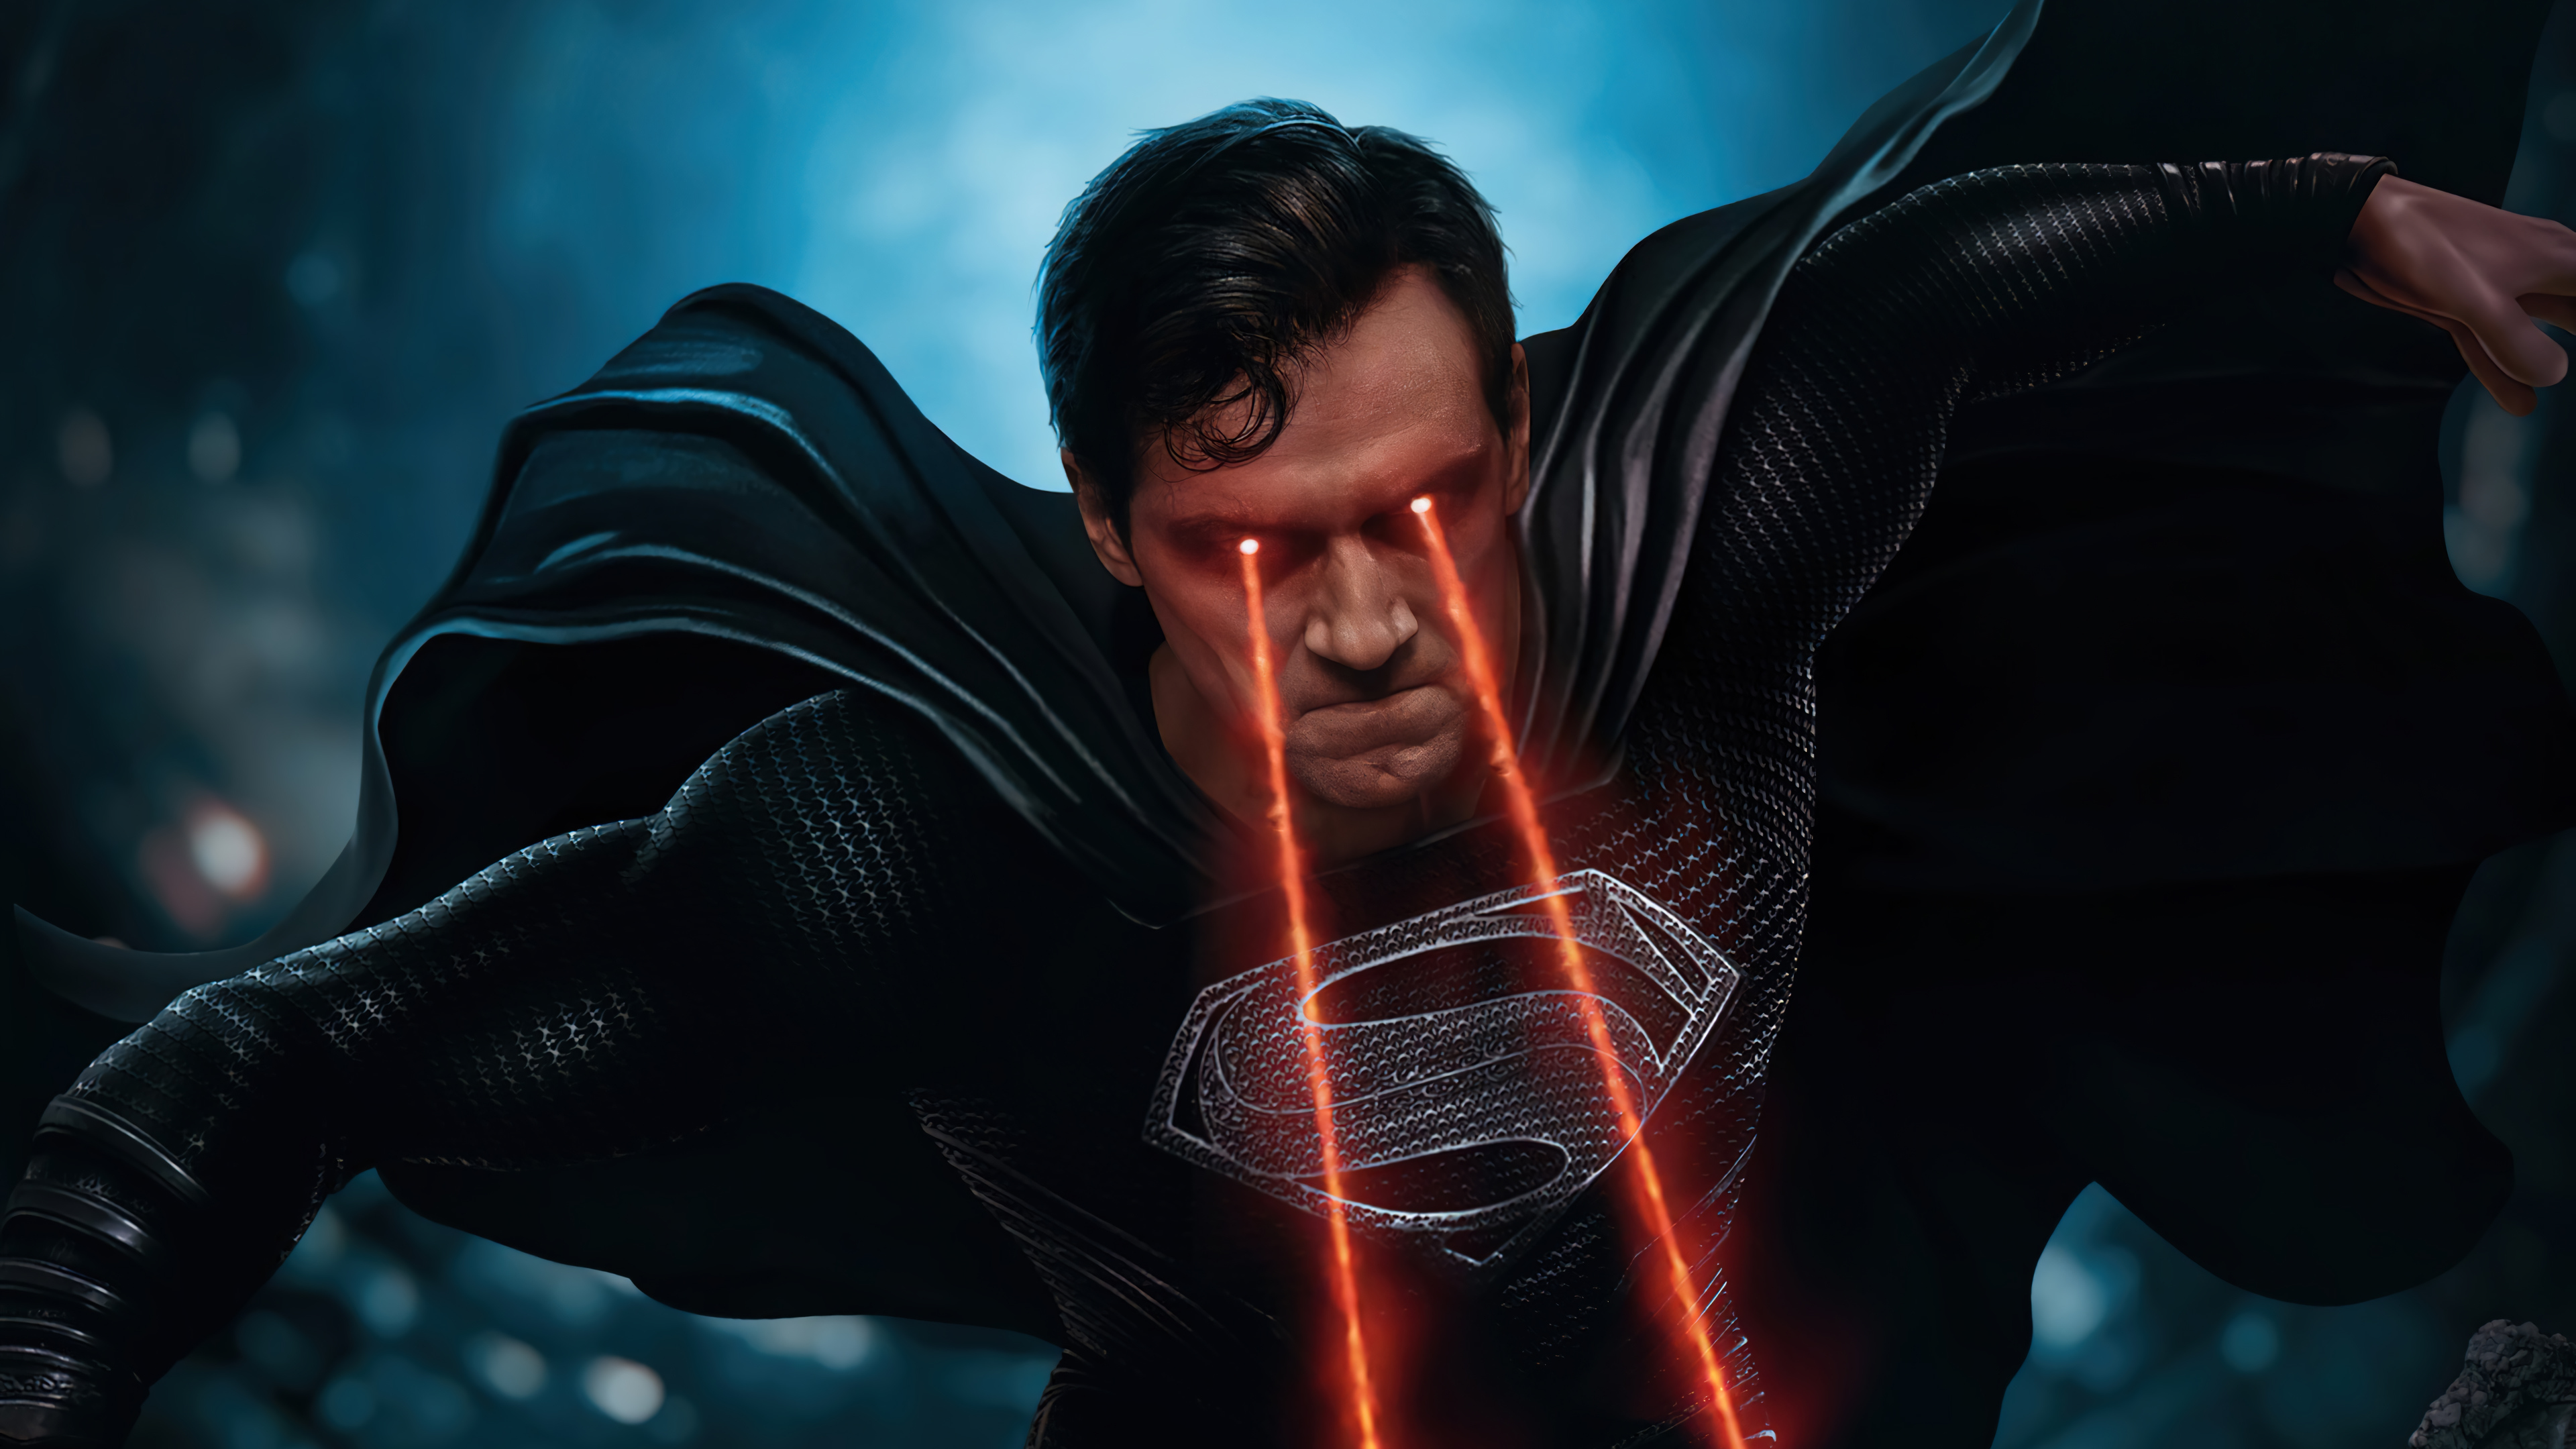 Fondos de pantalla Superman traje negro Liga de la justicia Snyder cut